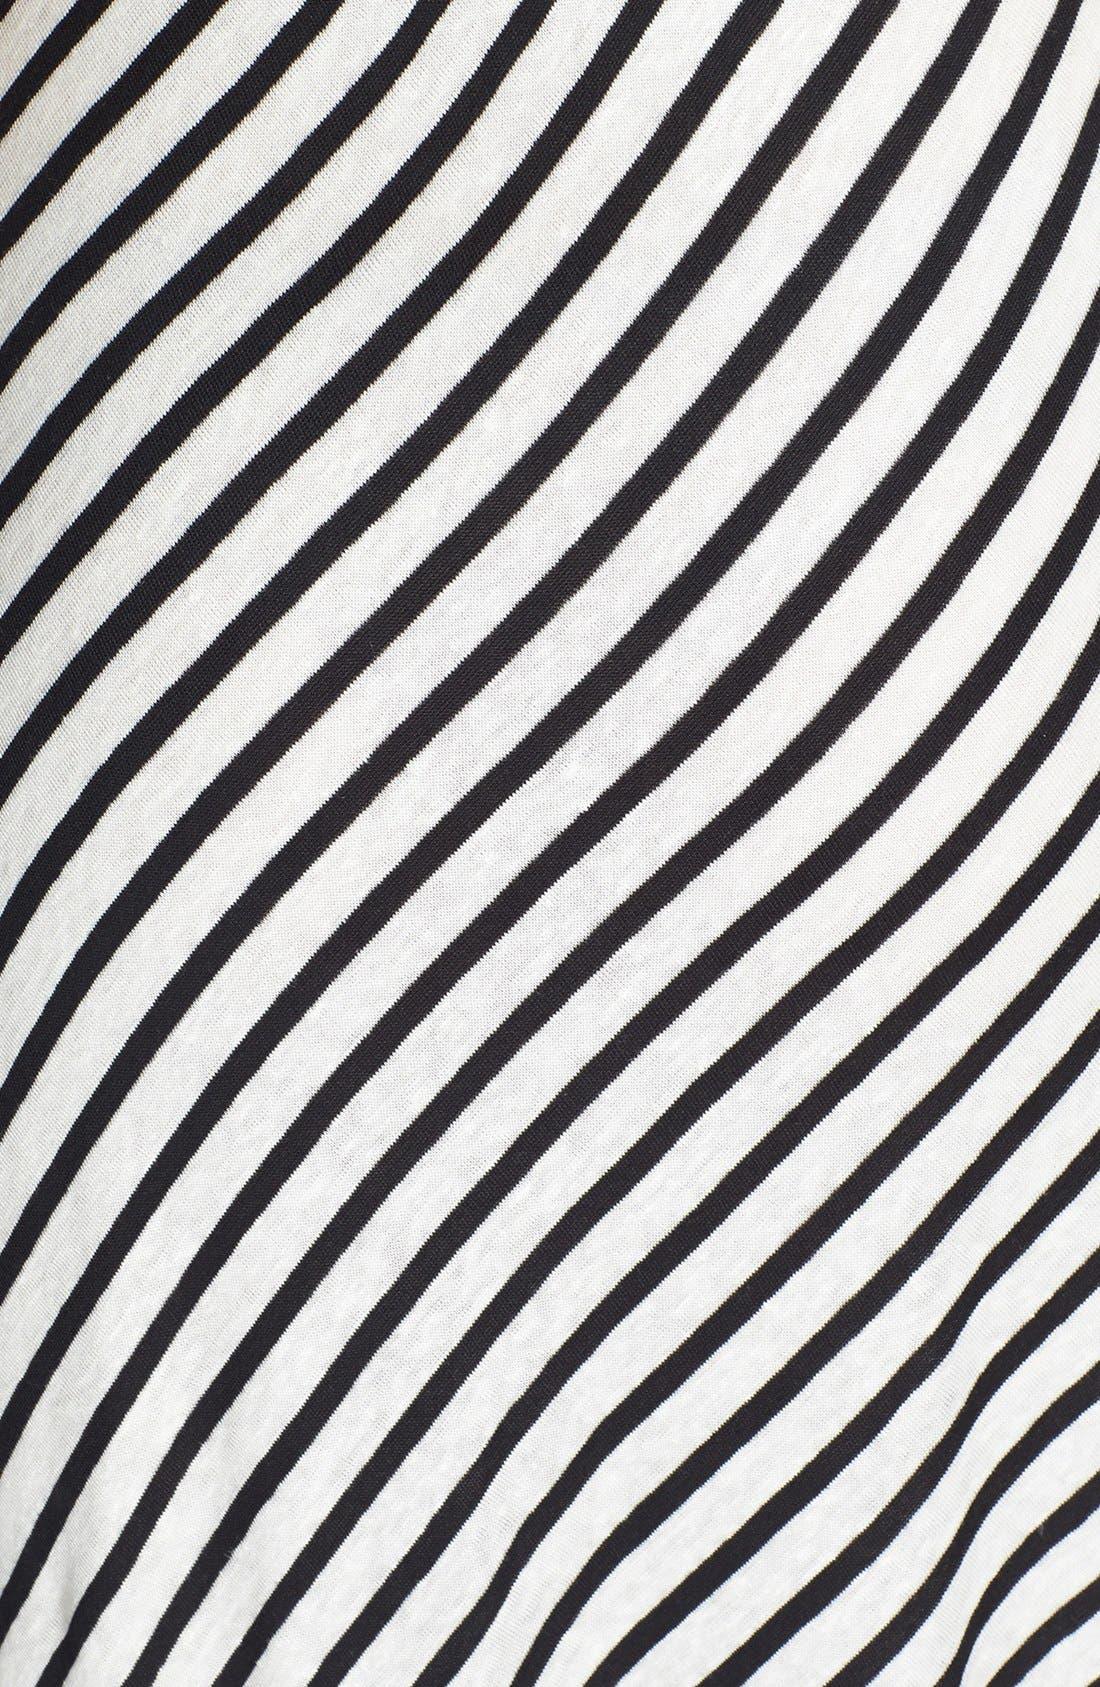 Alternate Image 3  - Dolce Vita Linen & Cotton Stripe Maxi Dress